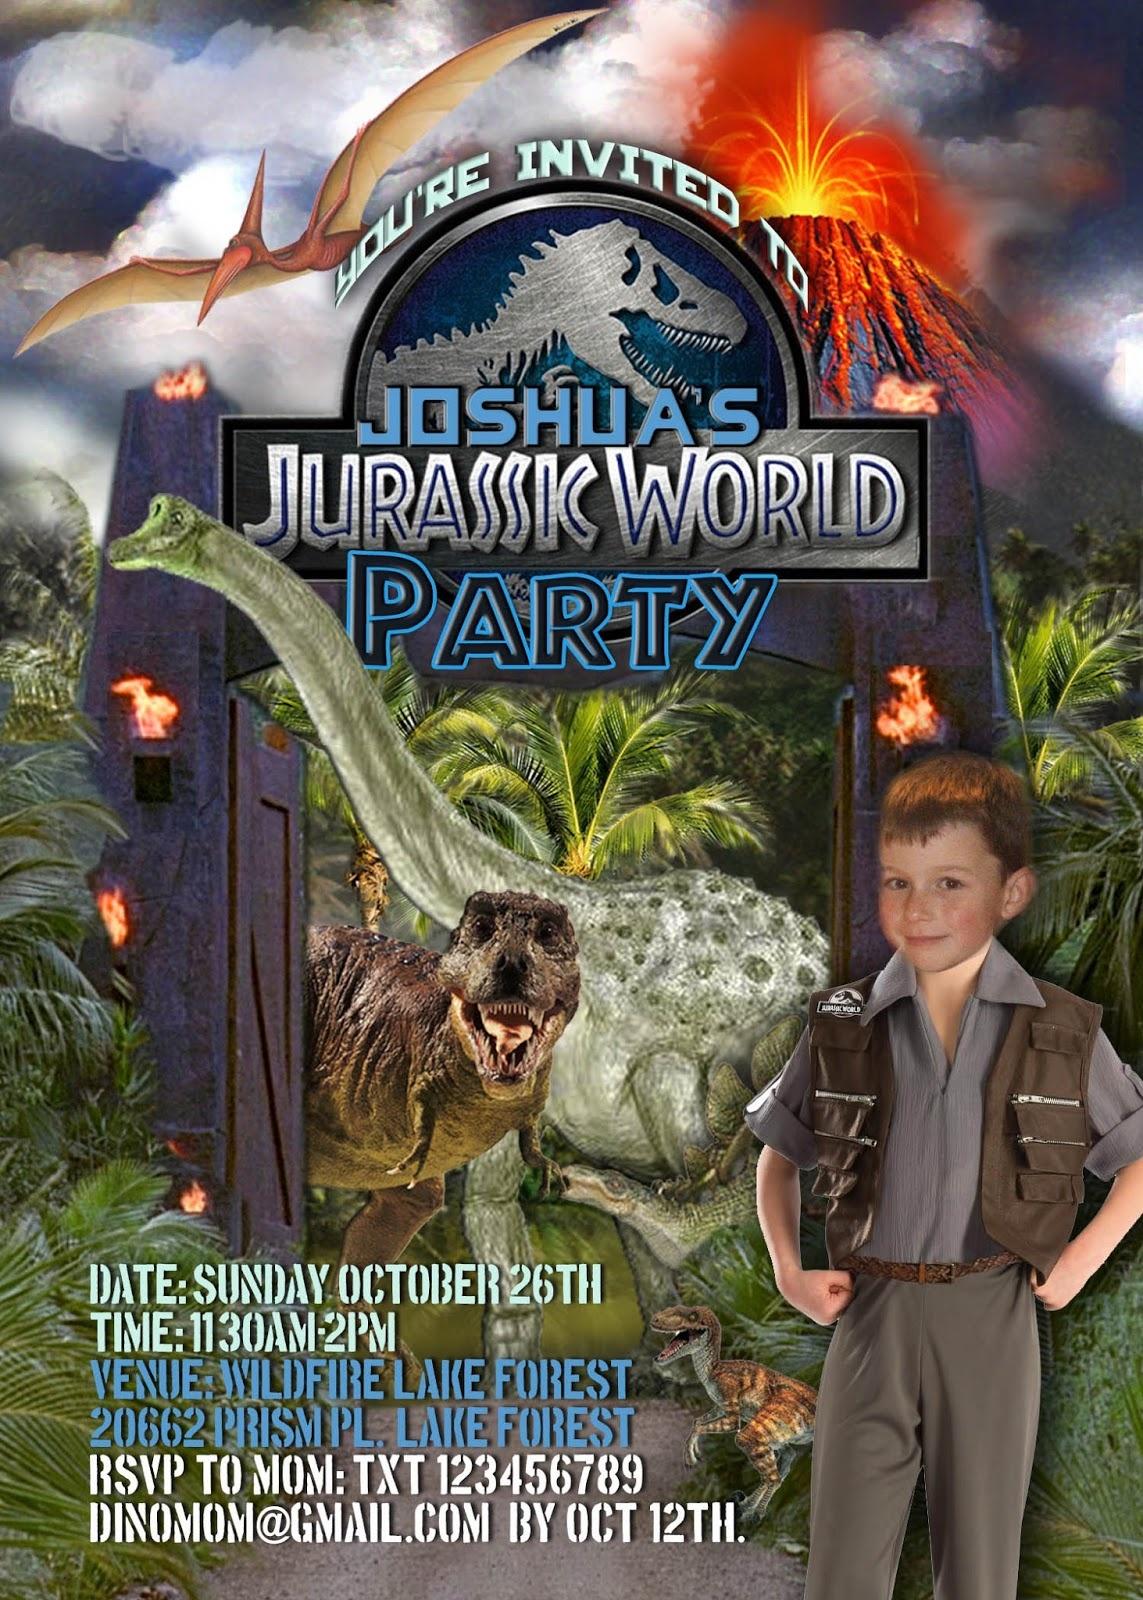 Free Kids Party Invitations - Free Printable Jurassic Park Invitations